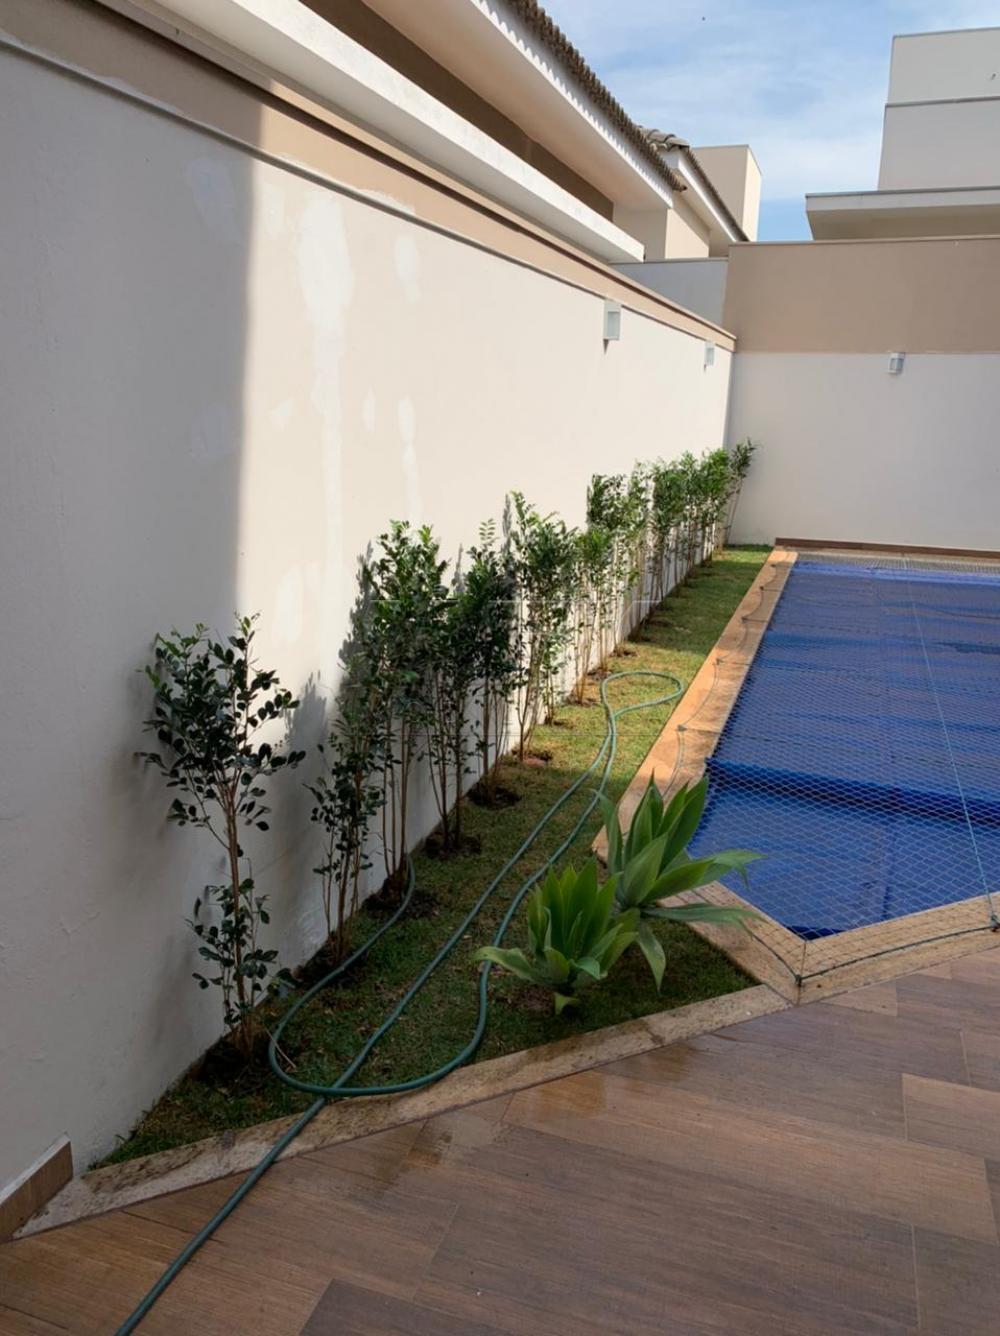 Alugar Casa / Condomínio em Bauru R$ 7.000,00 - Foto 25